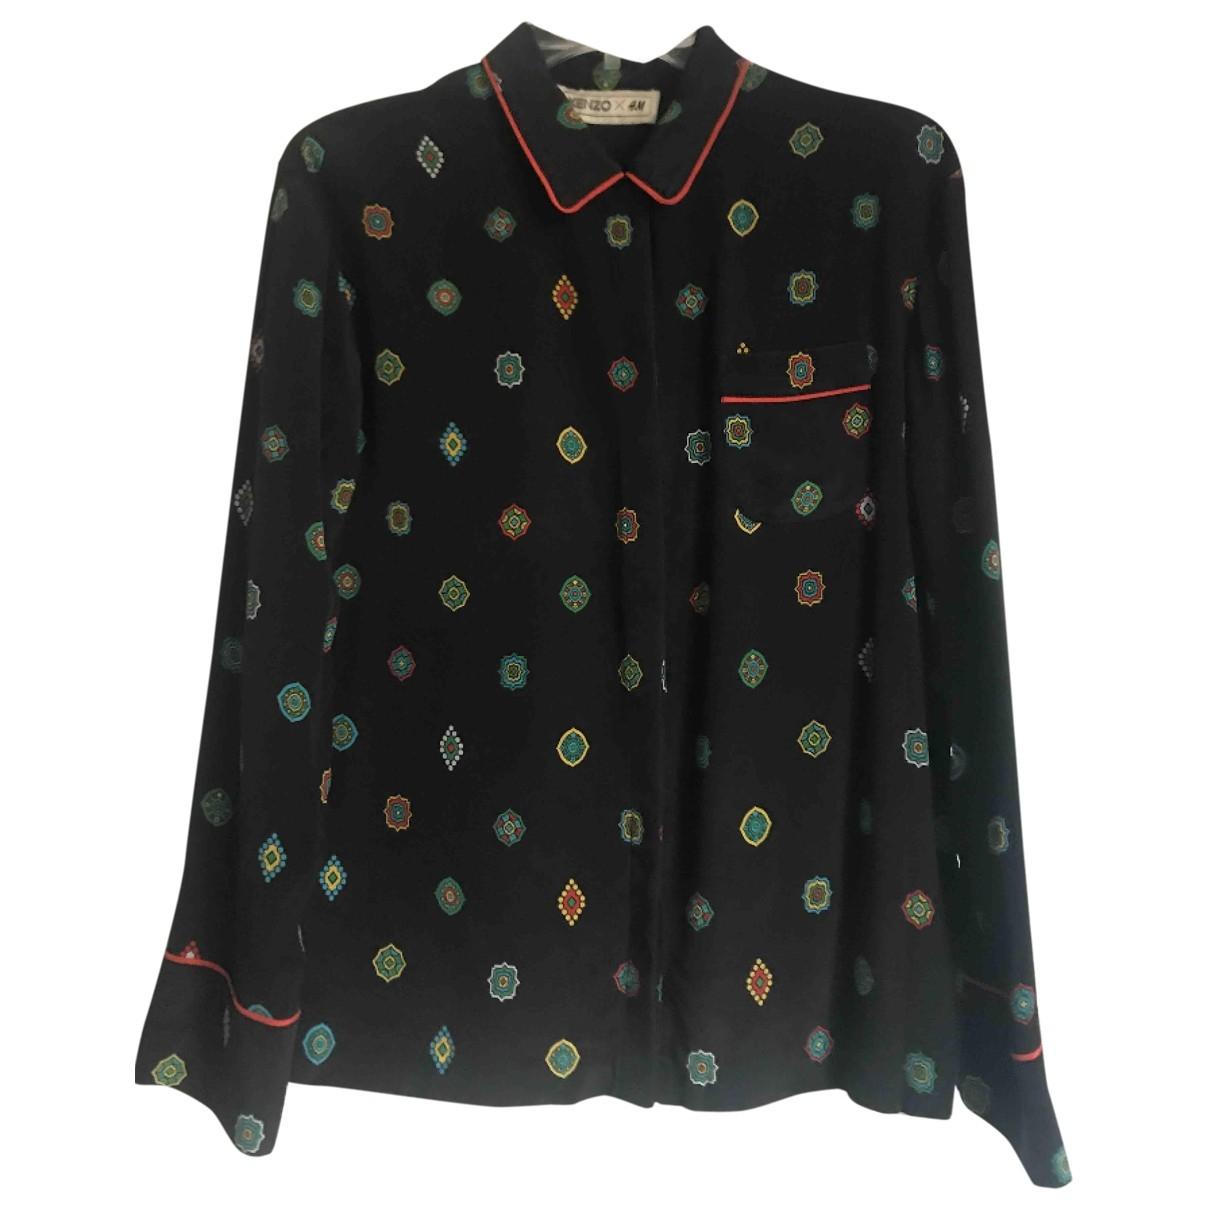 Kenzo X H&m \N Black Silk  top for Women 34 FR